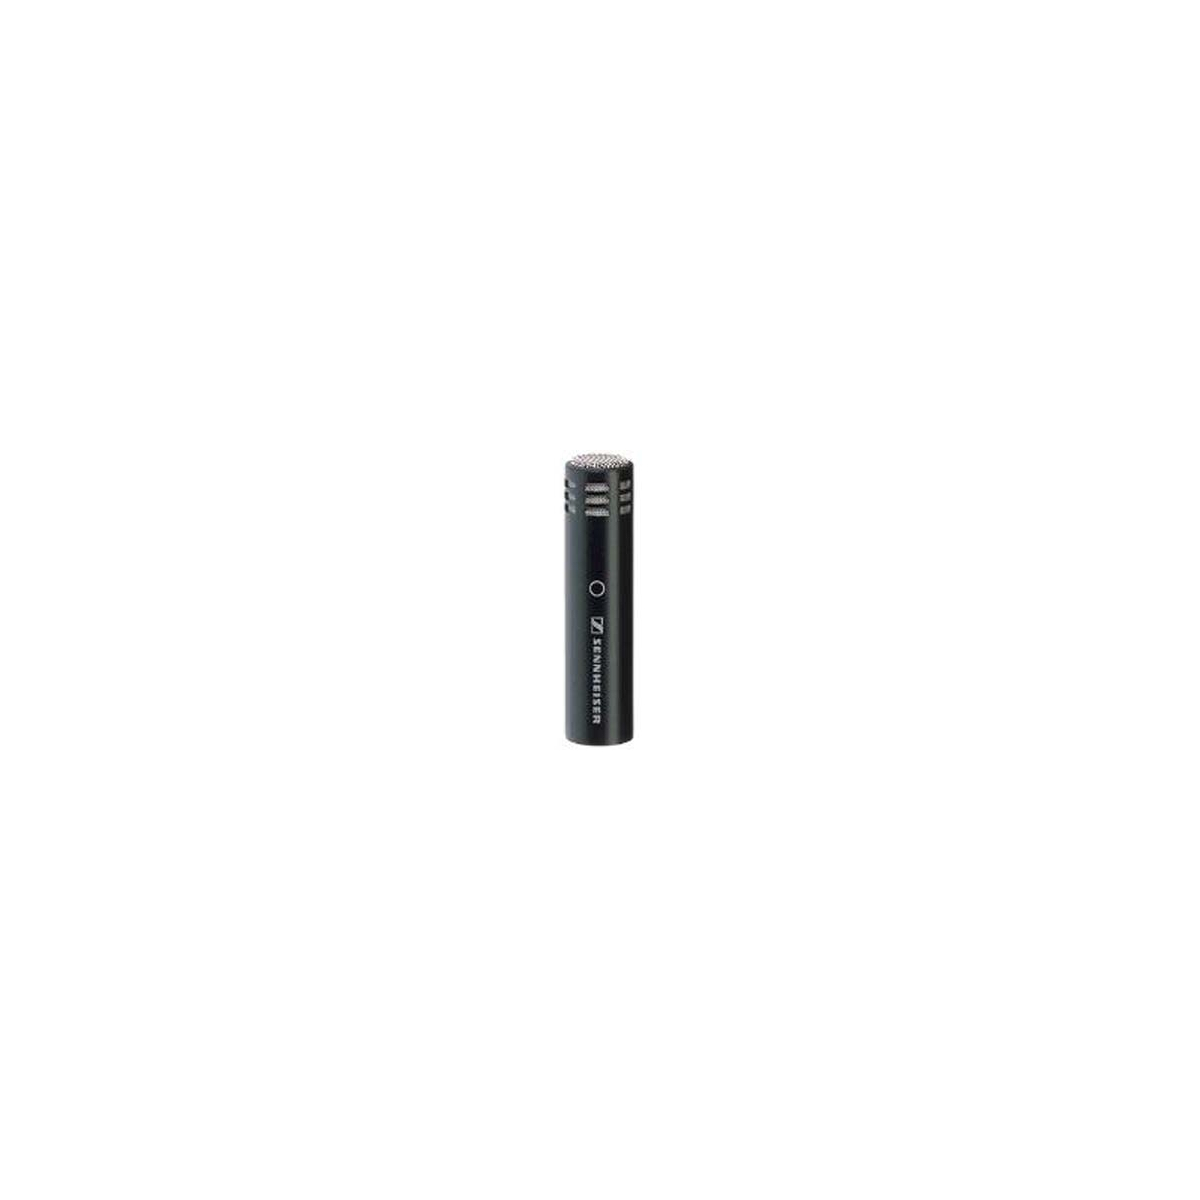 Micros instruments - Sennheiser - e614